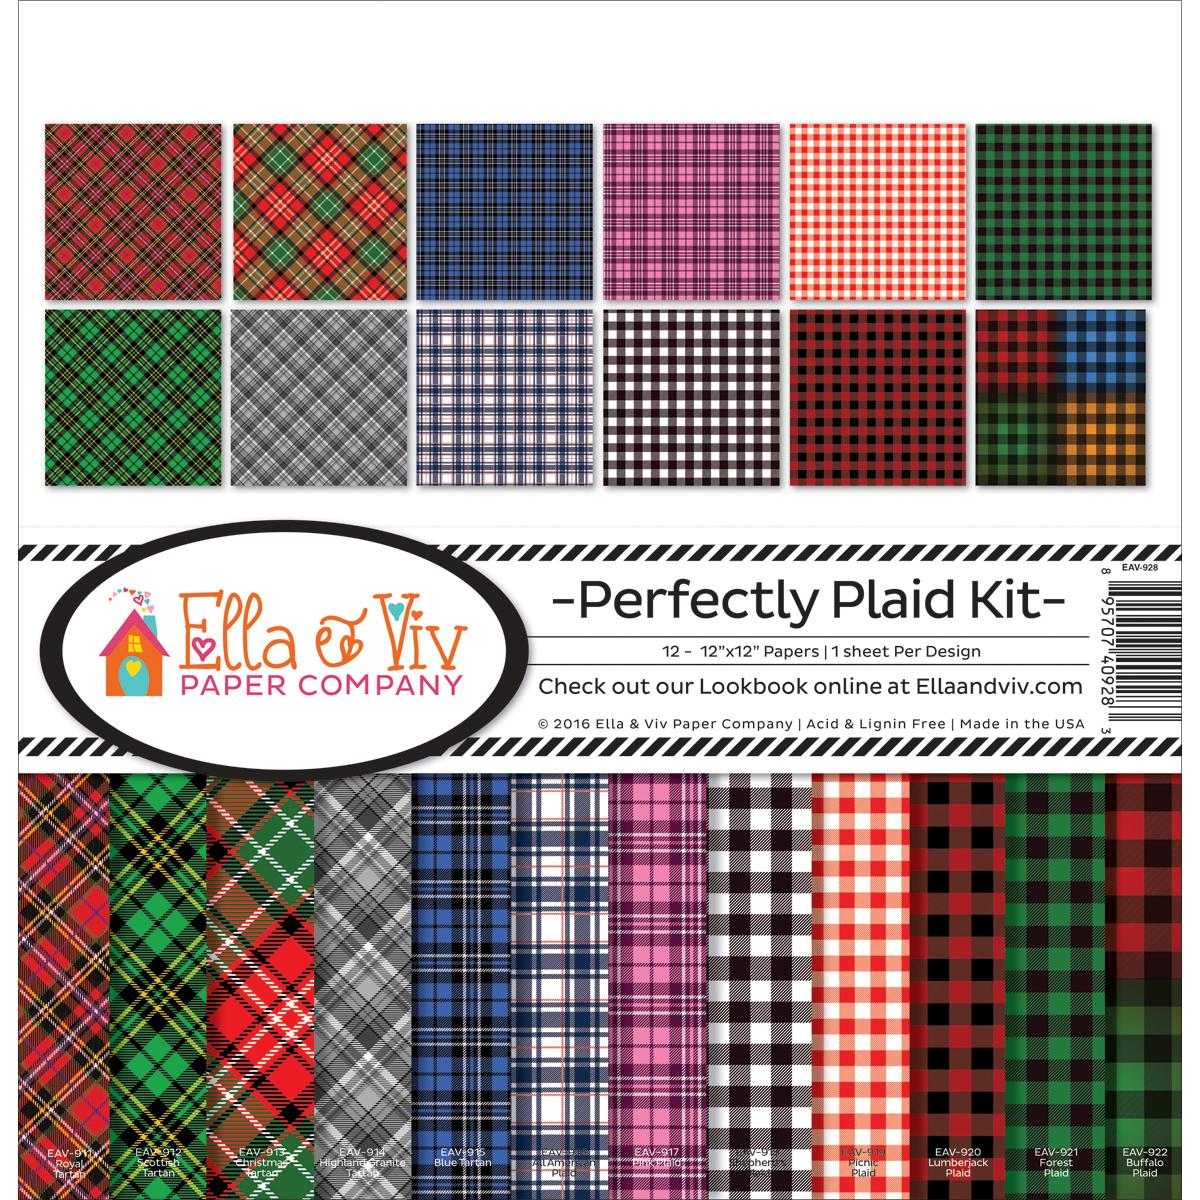 Ella & Viv Collection Kit 12'x12' - Perfectly Plaid